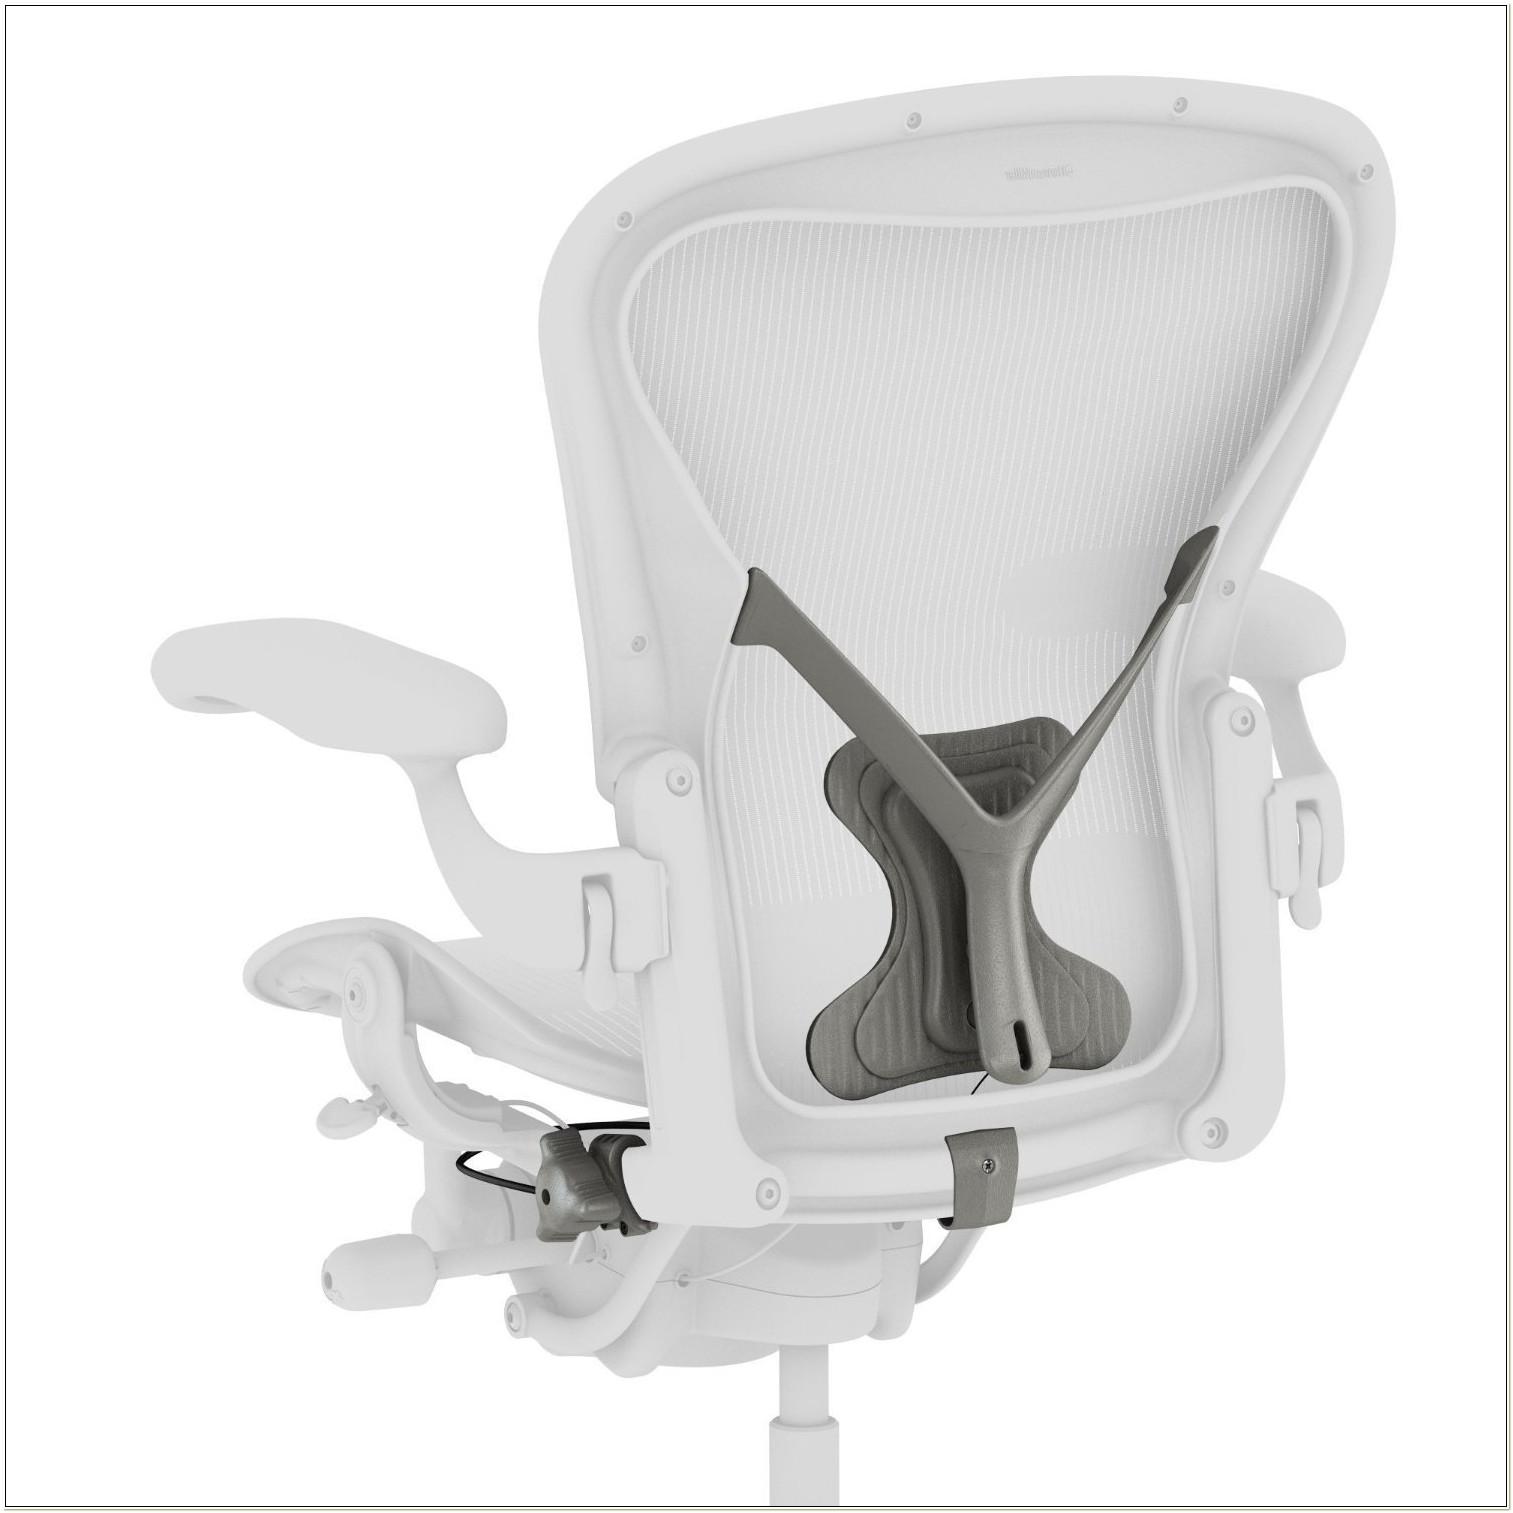 Herman Miller Aeron Chair Size C Posturefit